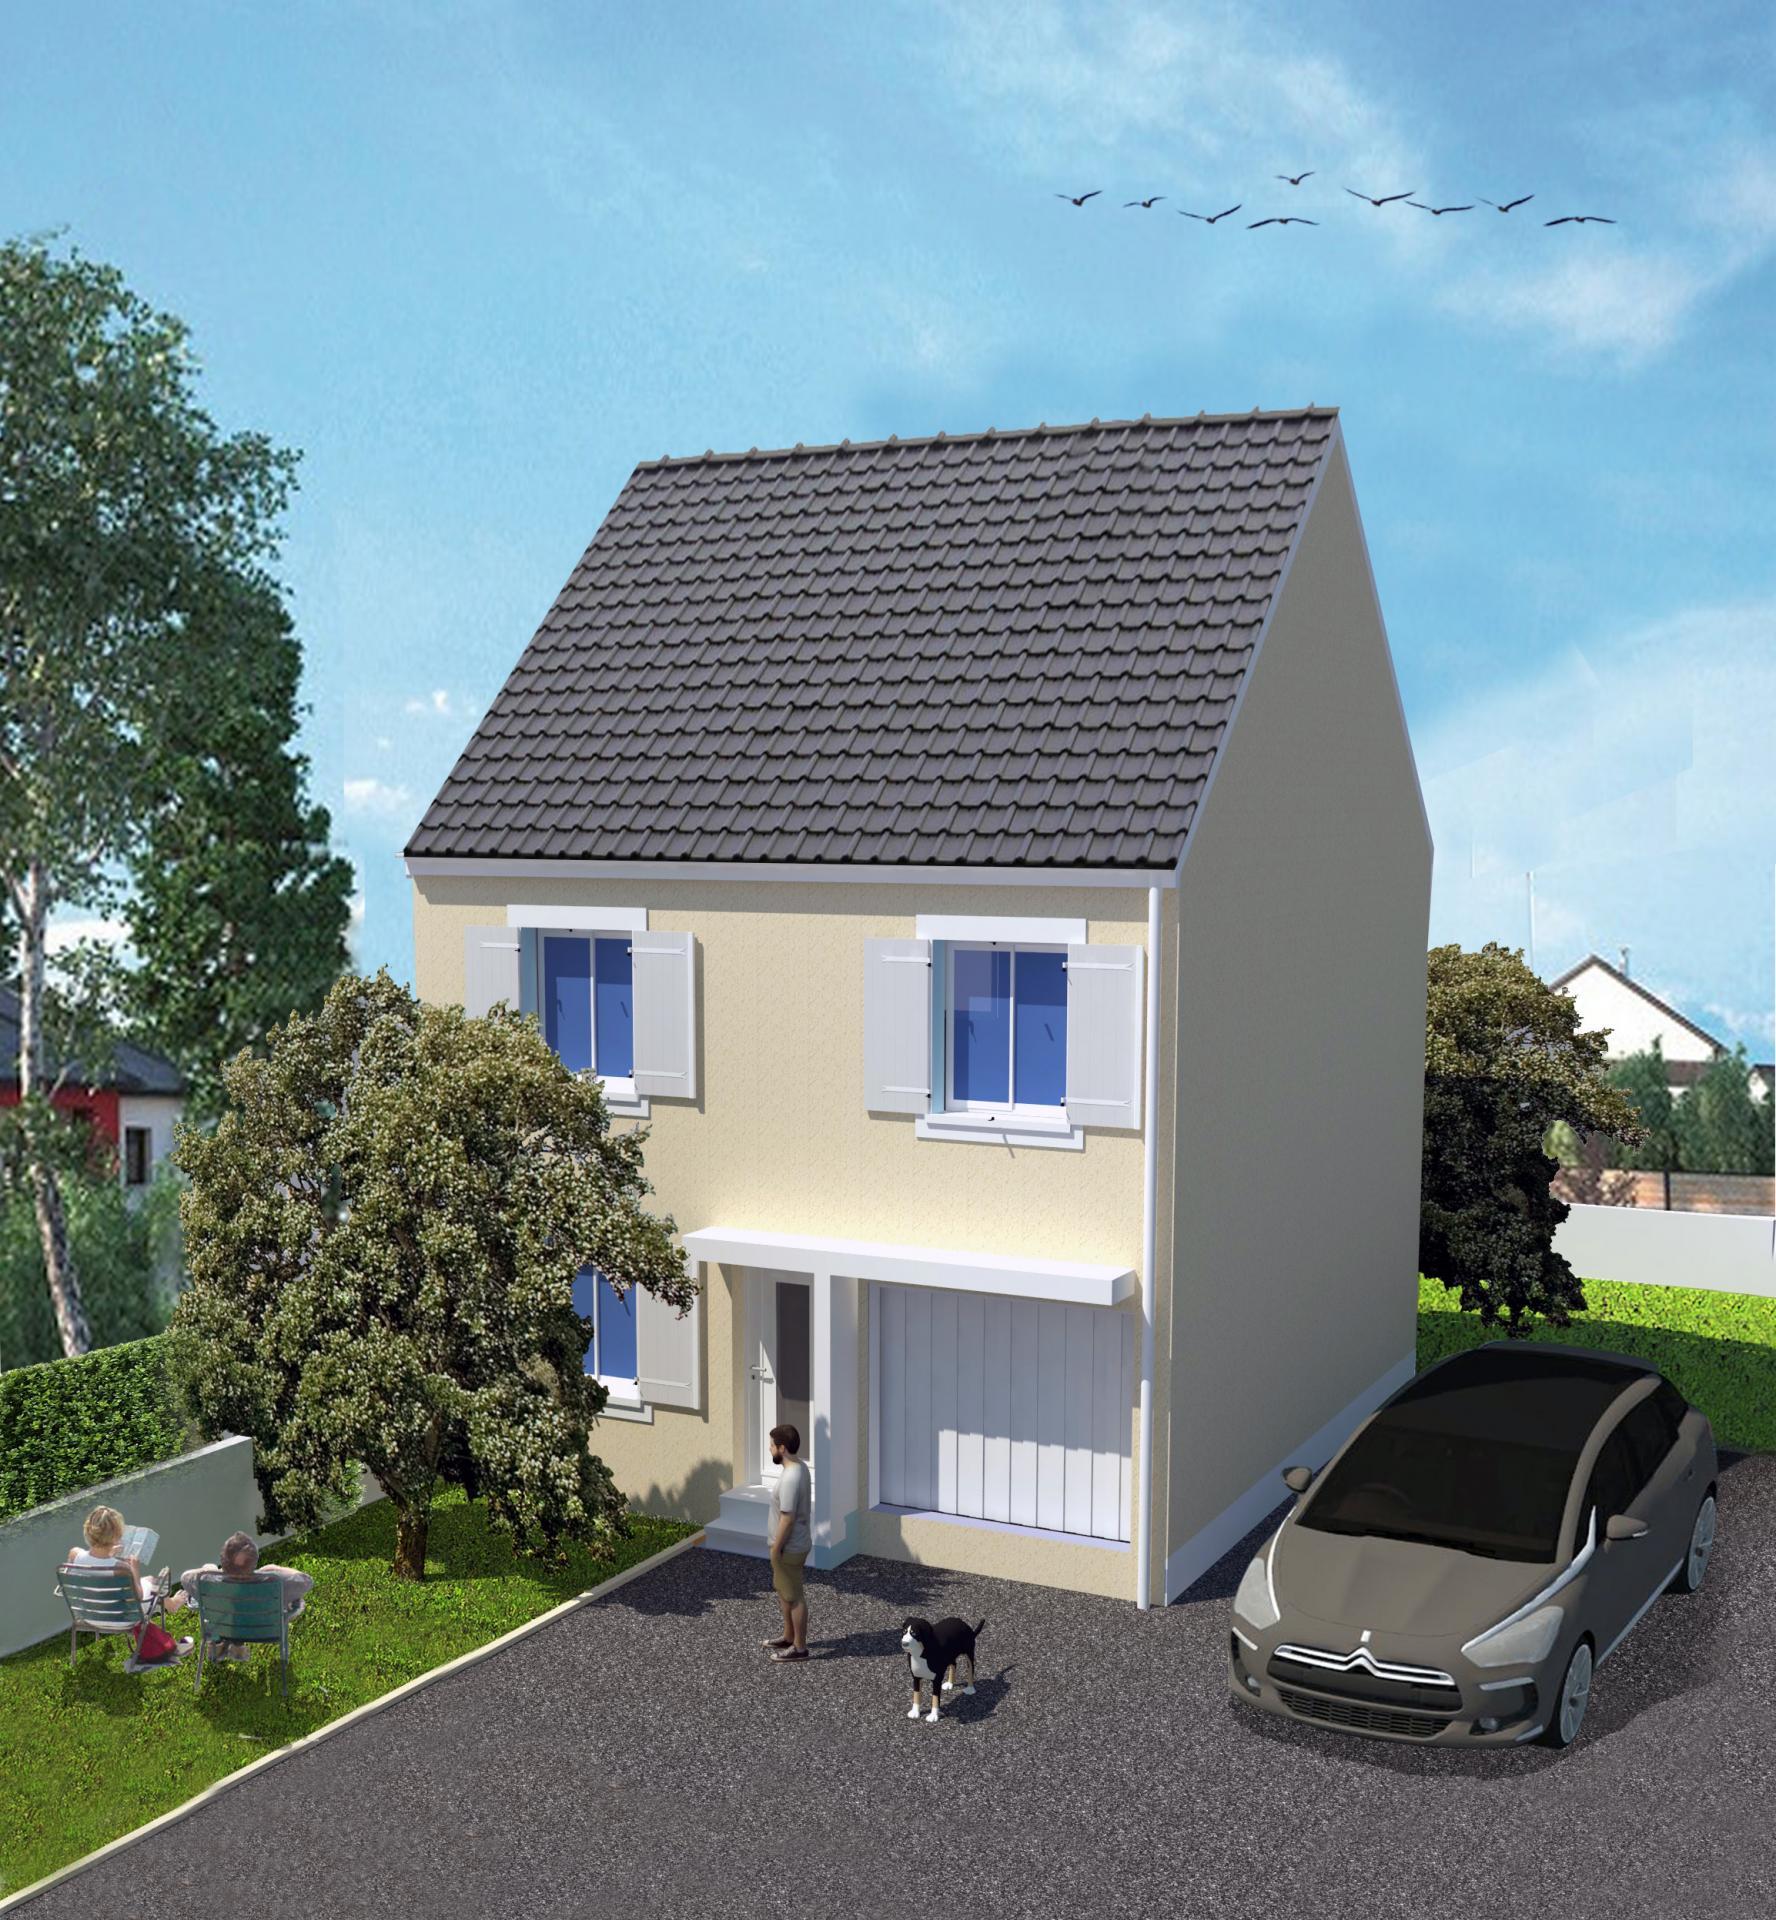 3d mod lisation 3d mod lisation ext rieur maquette 3d. Black Bedroom Furniture Sets. Home Design Ideas